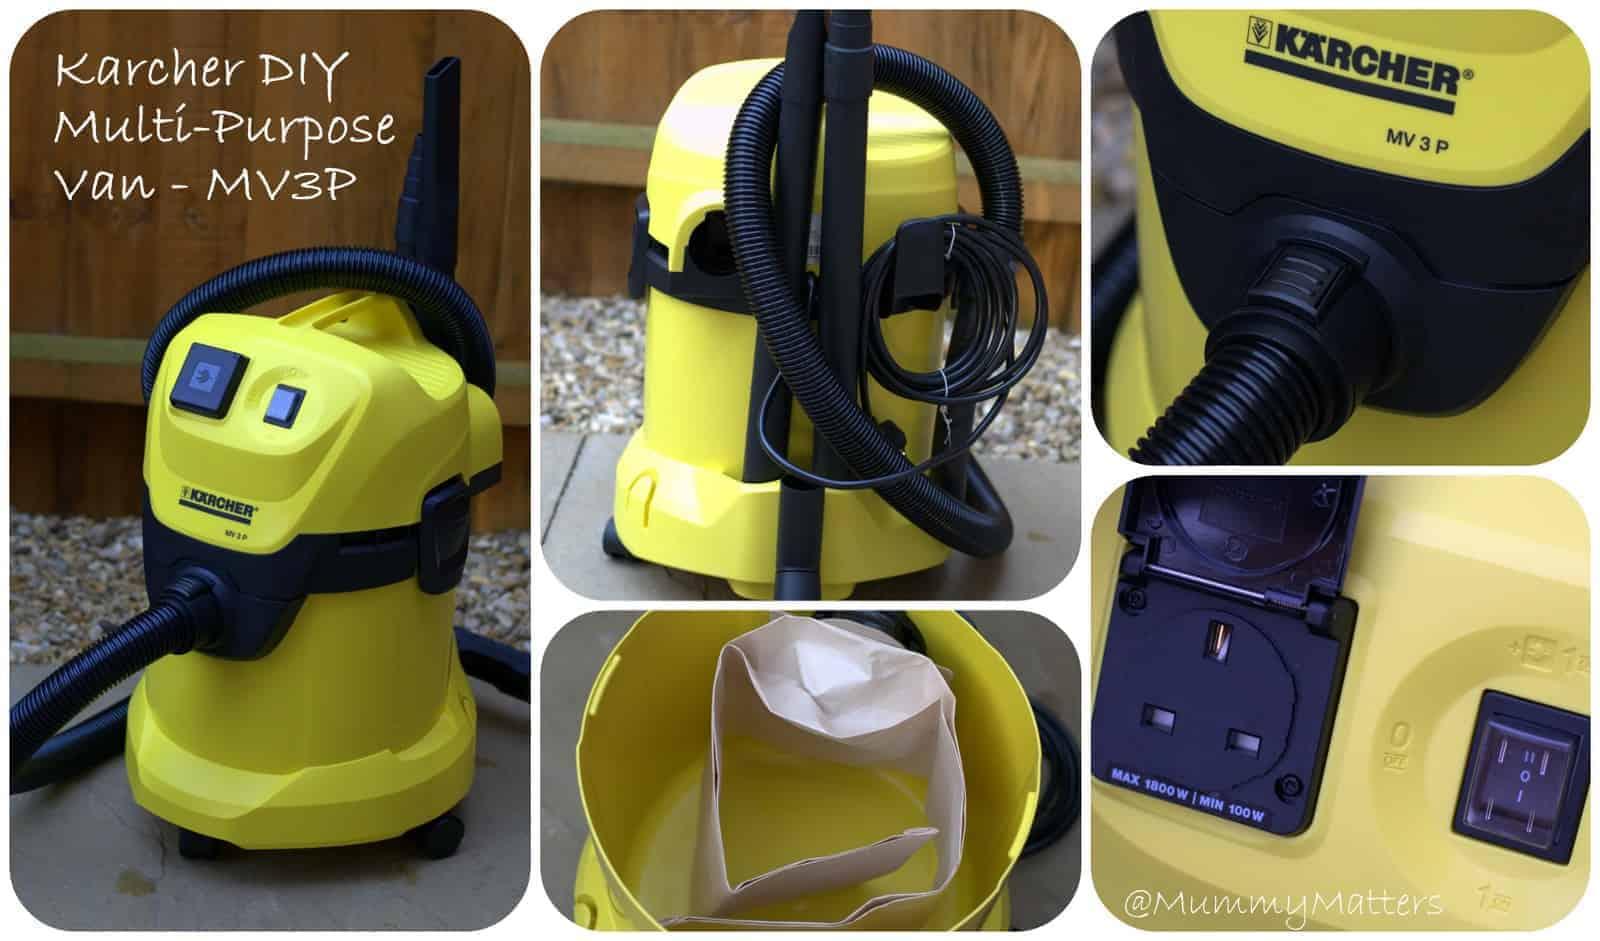 Karcher DIY Multi Purpose Vac – MV3P